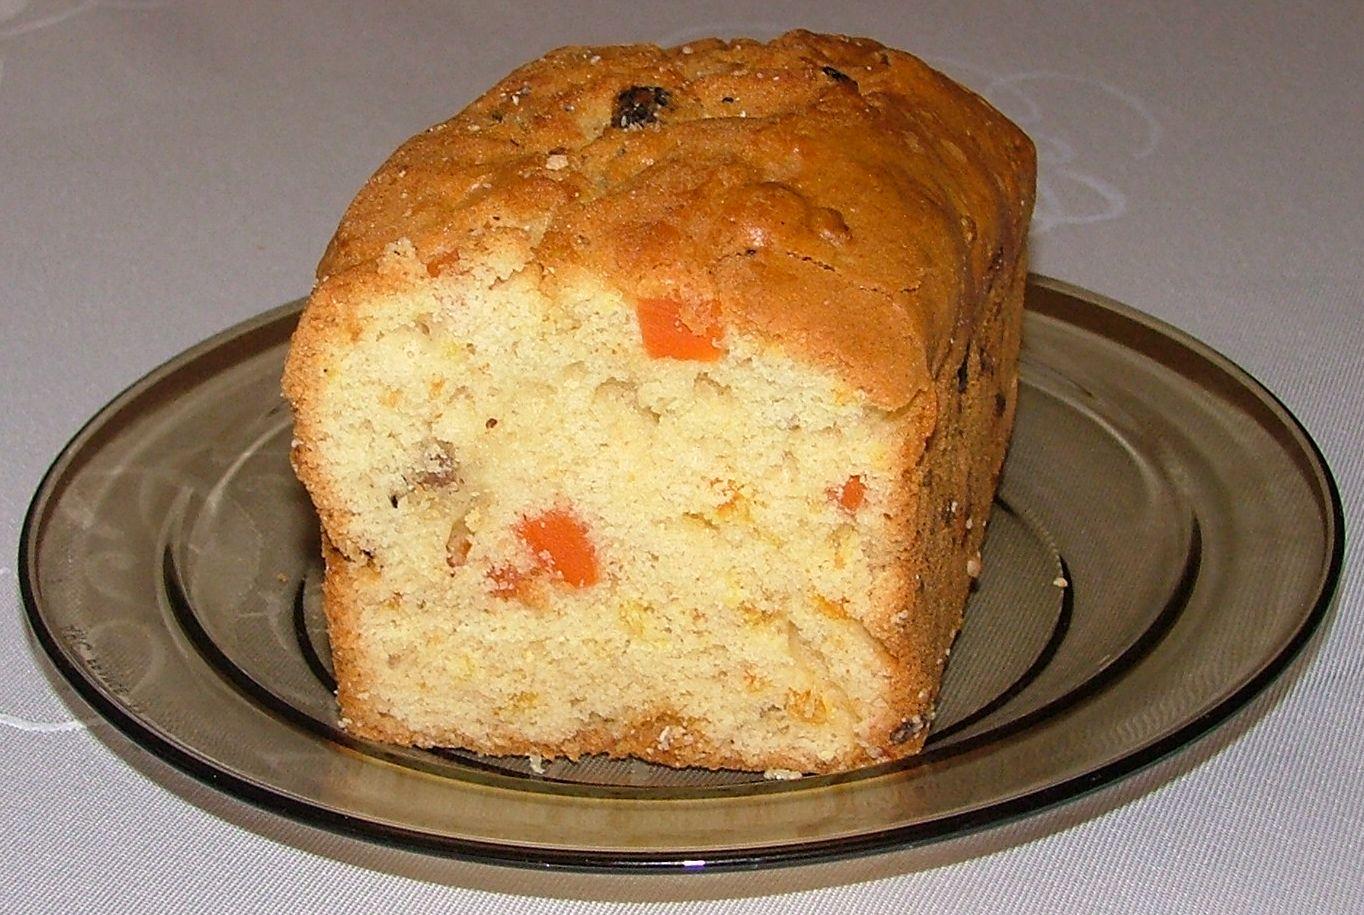 Fruit Cake Use As Doorstop